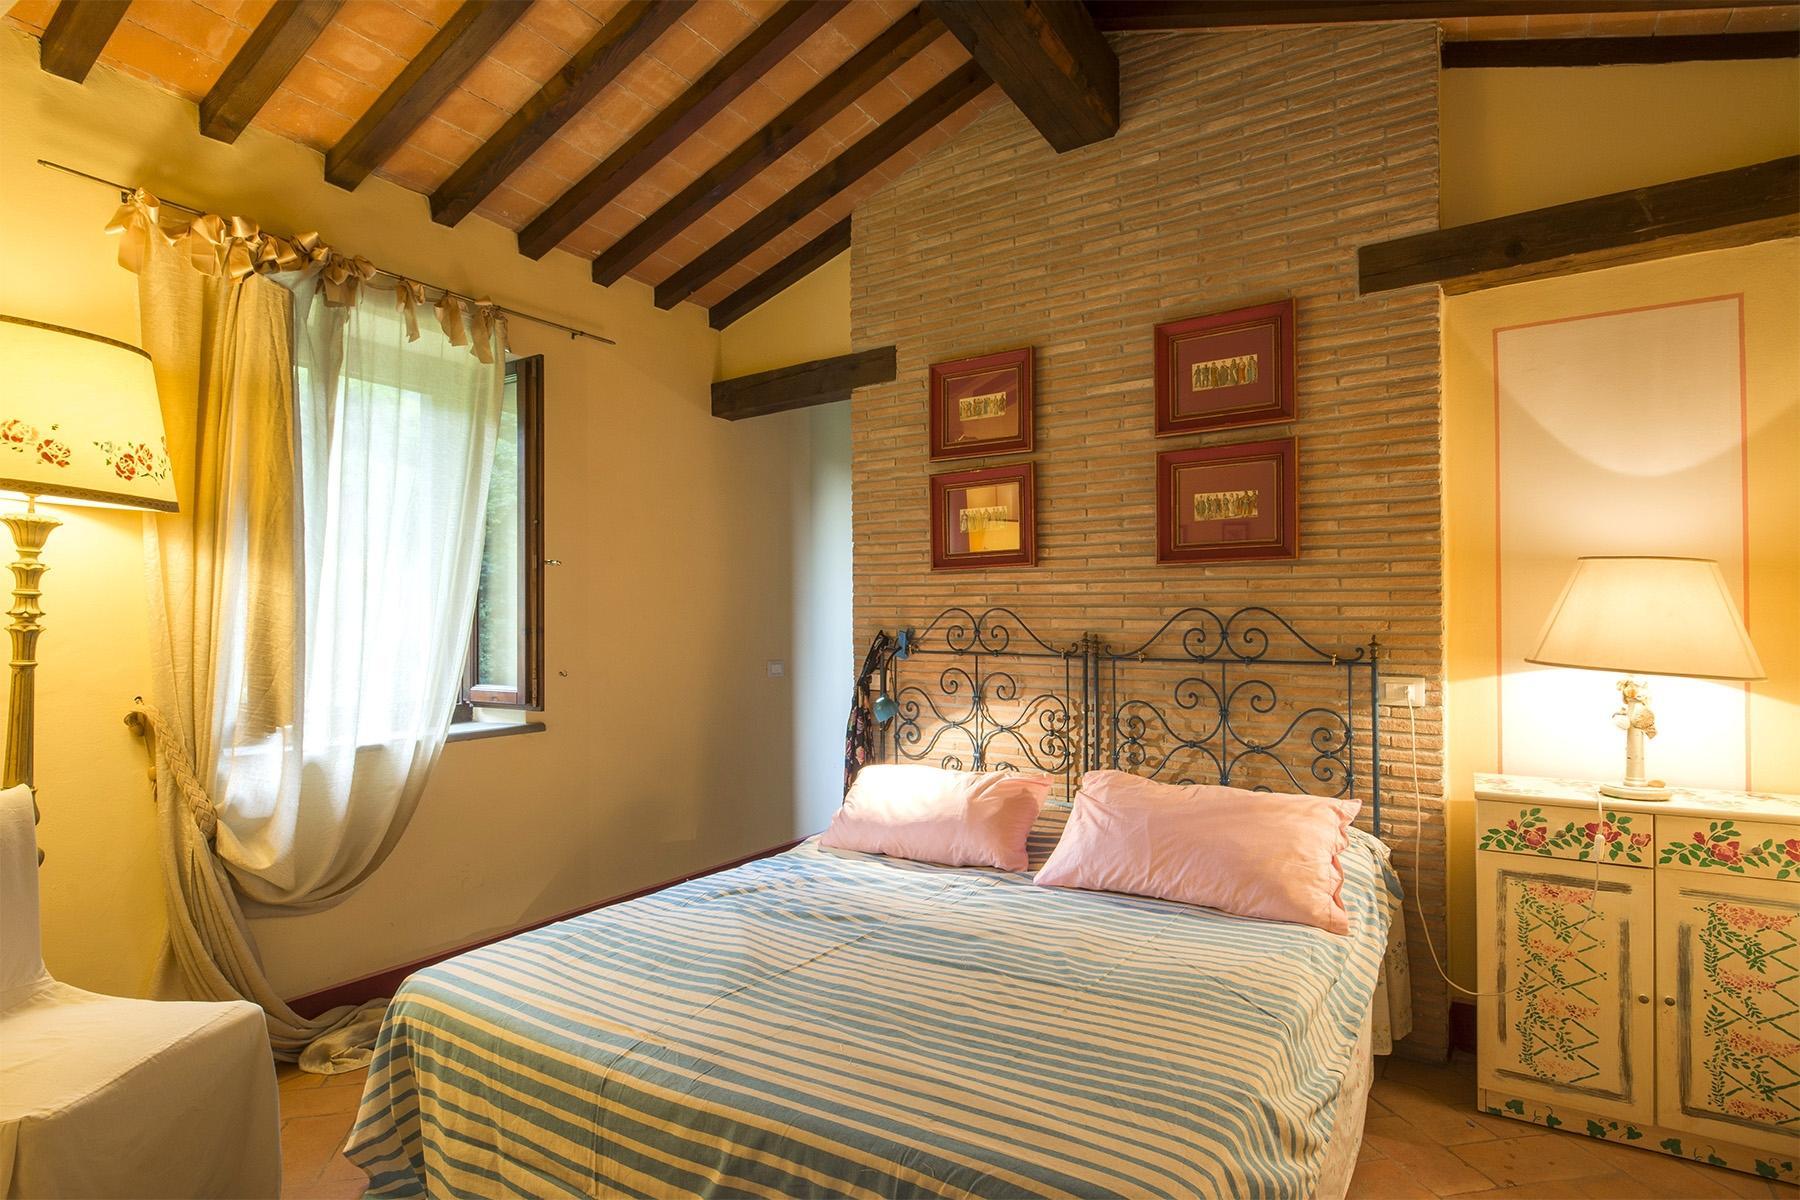 Superb property on the hills of Pisa - 11